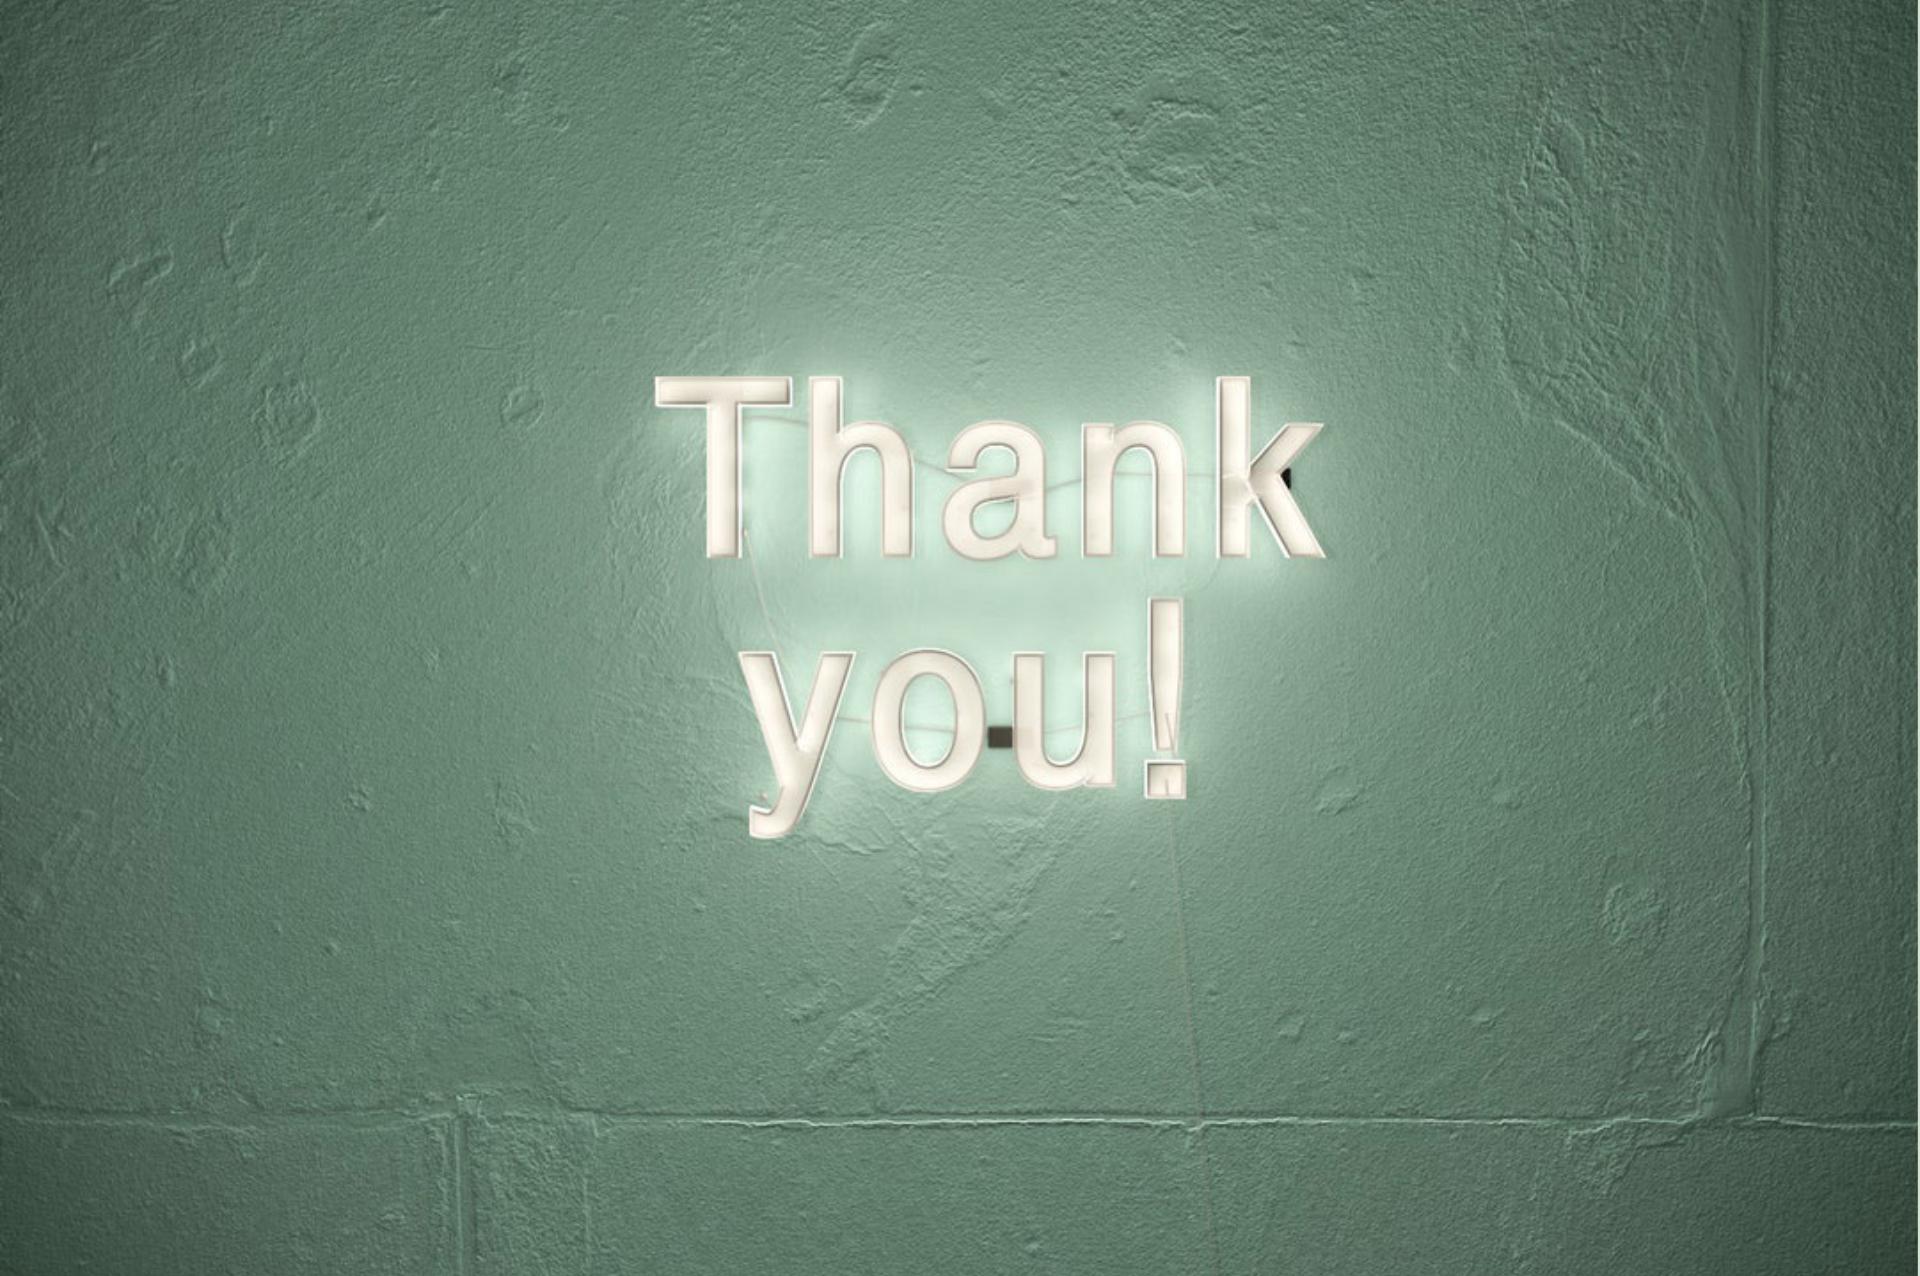 thank-you-landscape.jpg